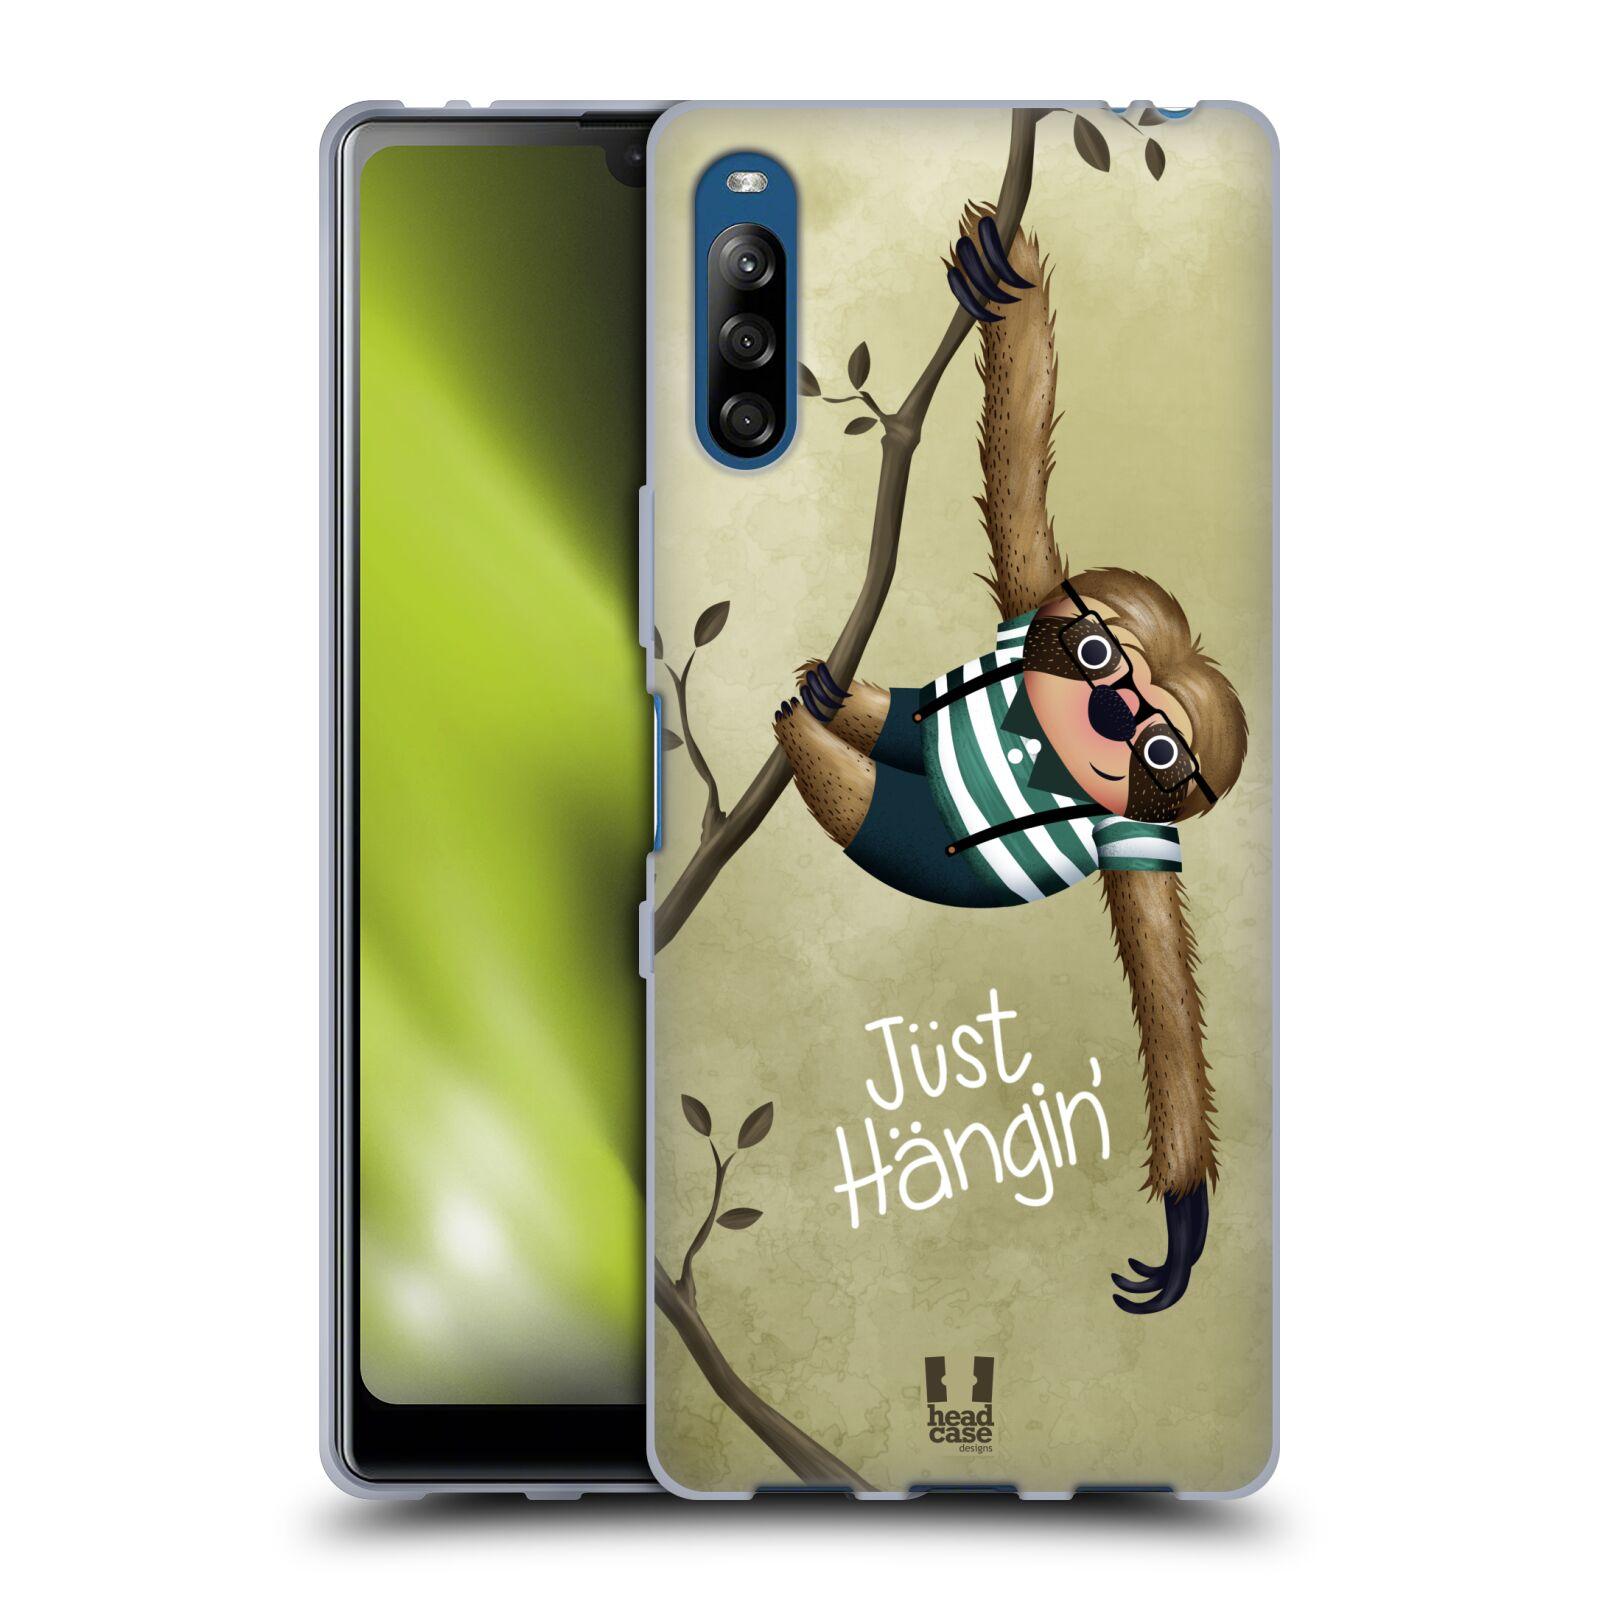 Silikonové pouzdro na mobil Sony Xperia L4 - Head Case - Lenochod Just Hangin